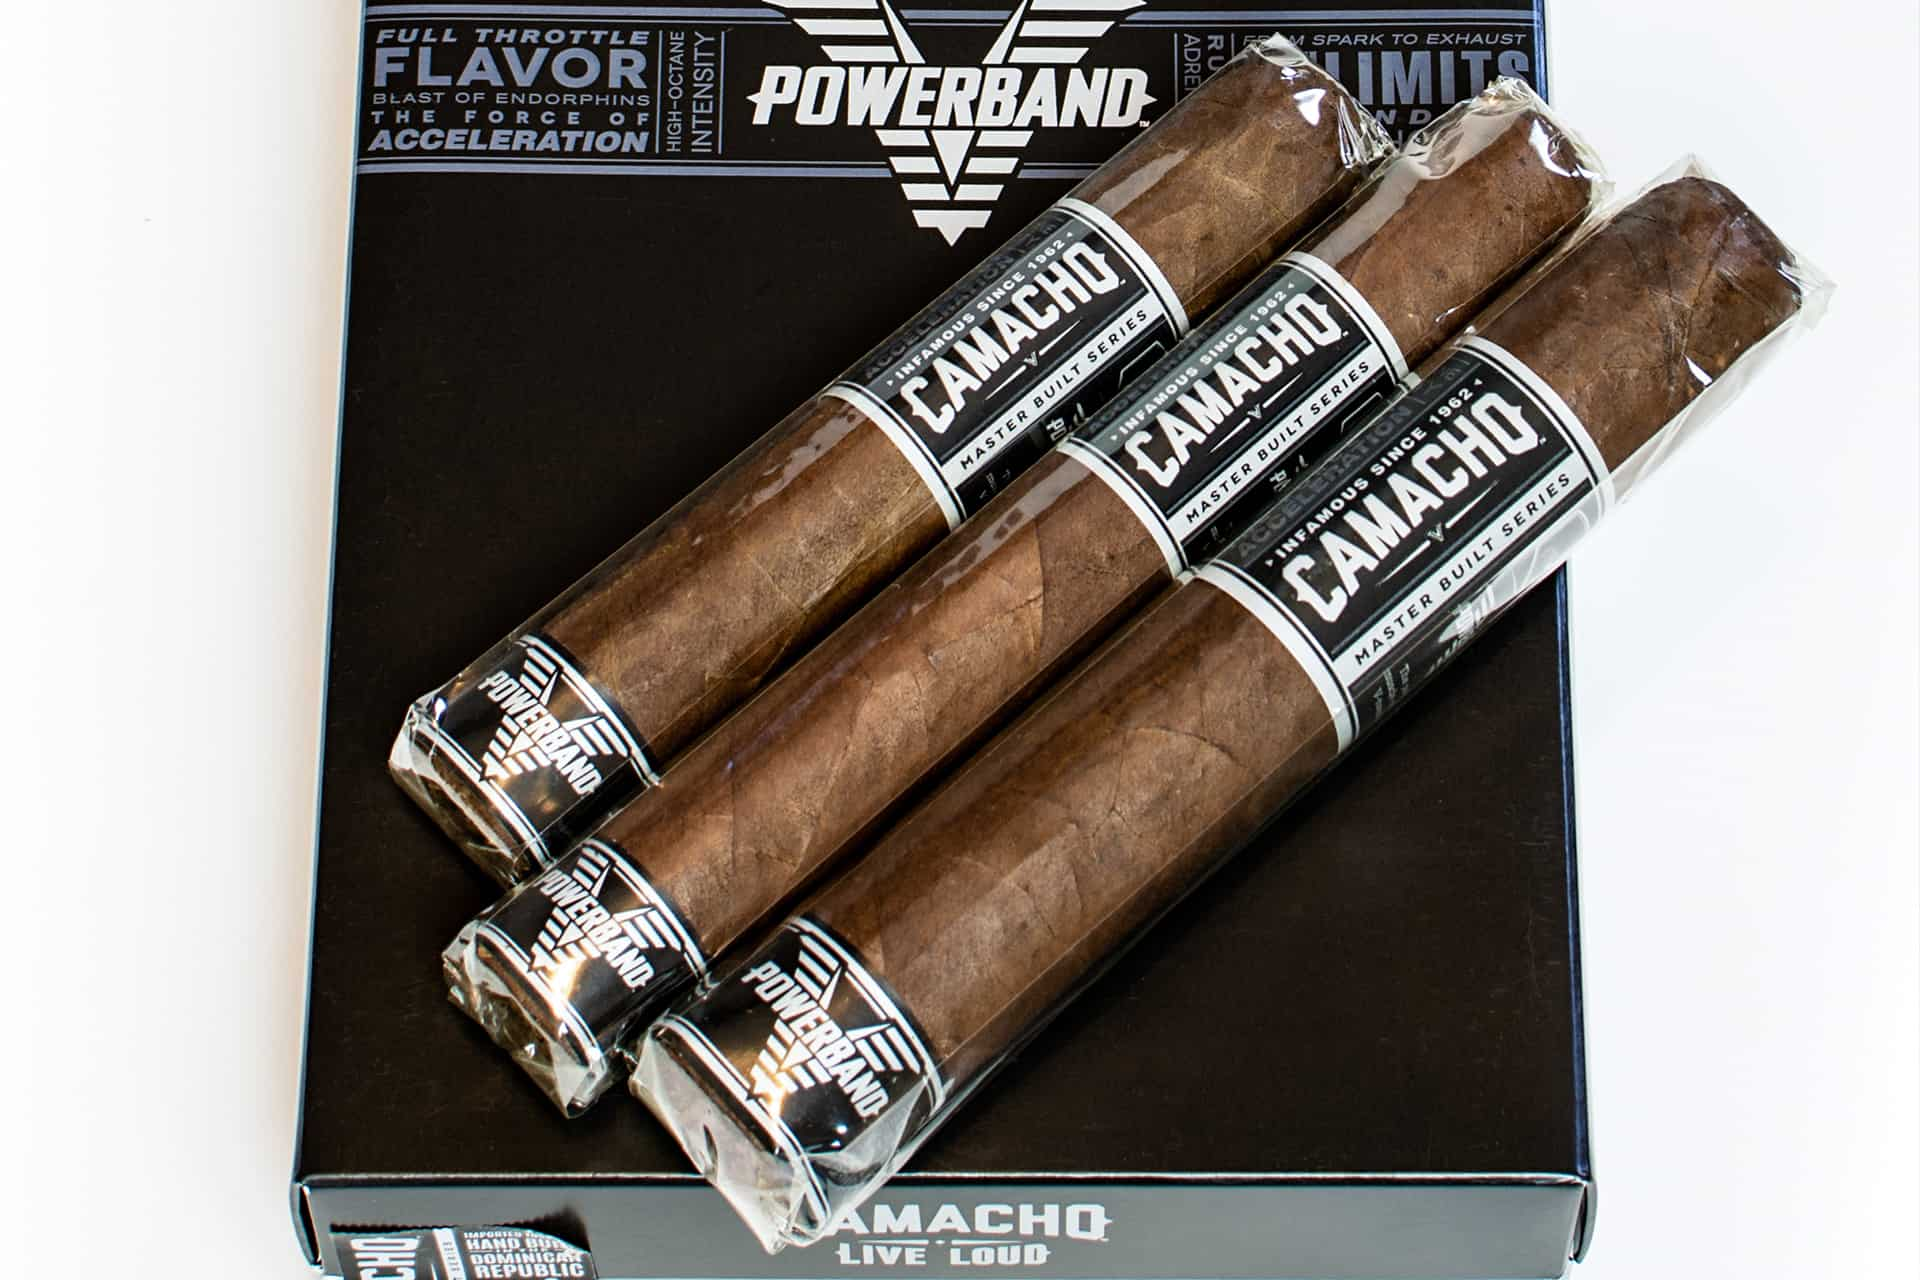 Camacho Powerband – 3 Cigar Sampler – Master Built Series